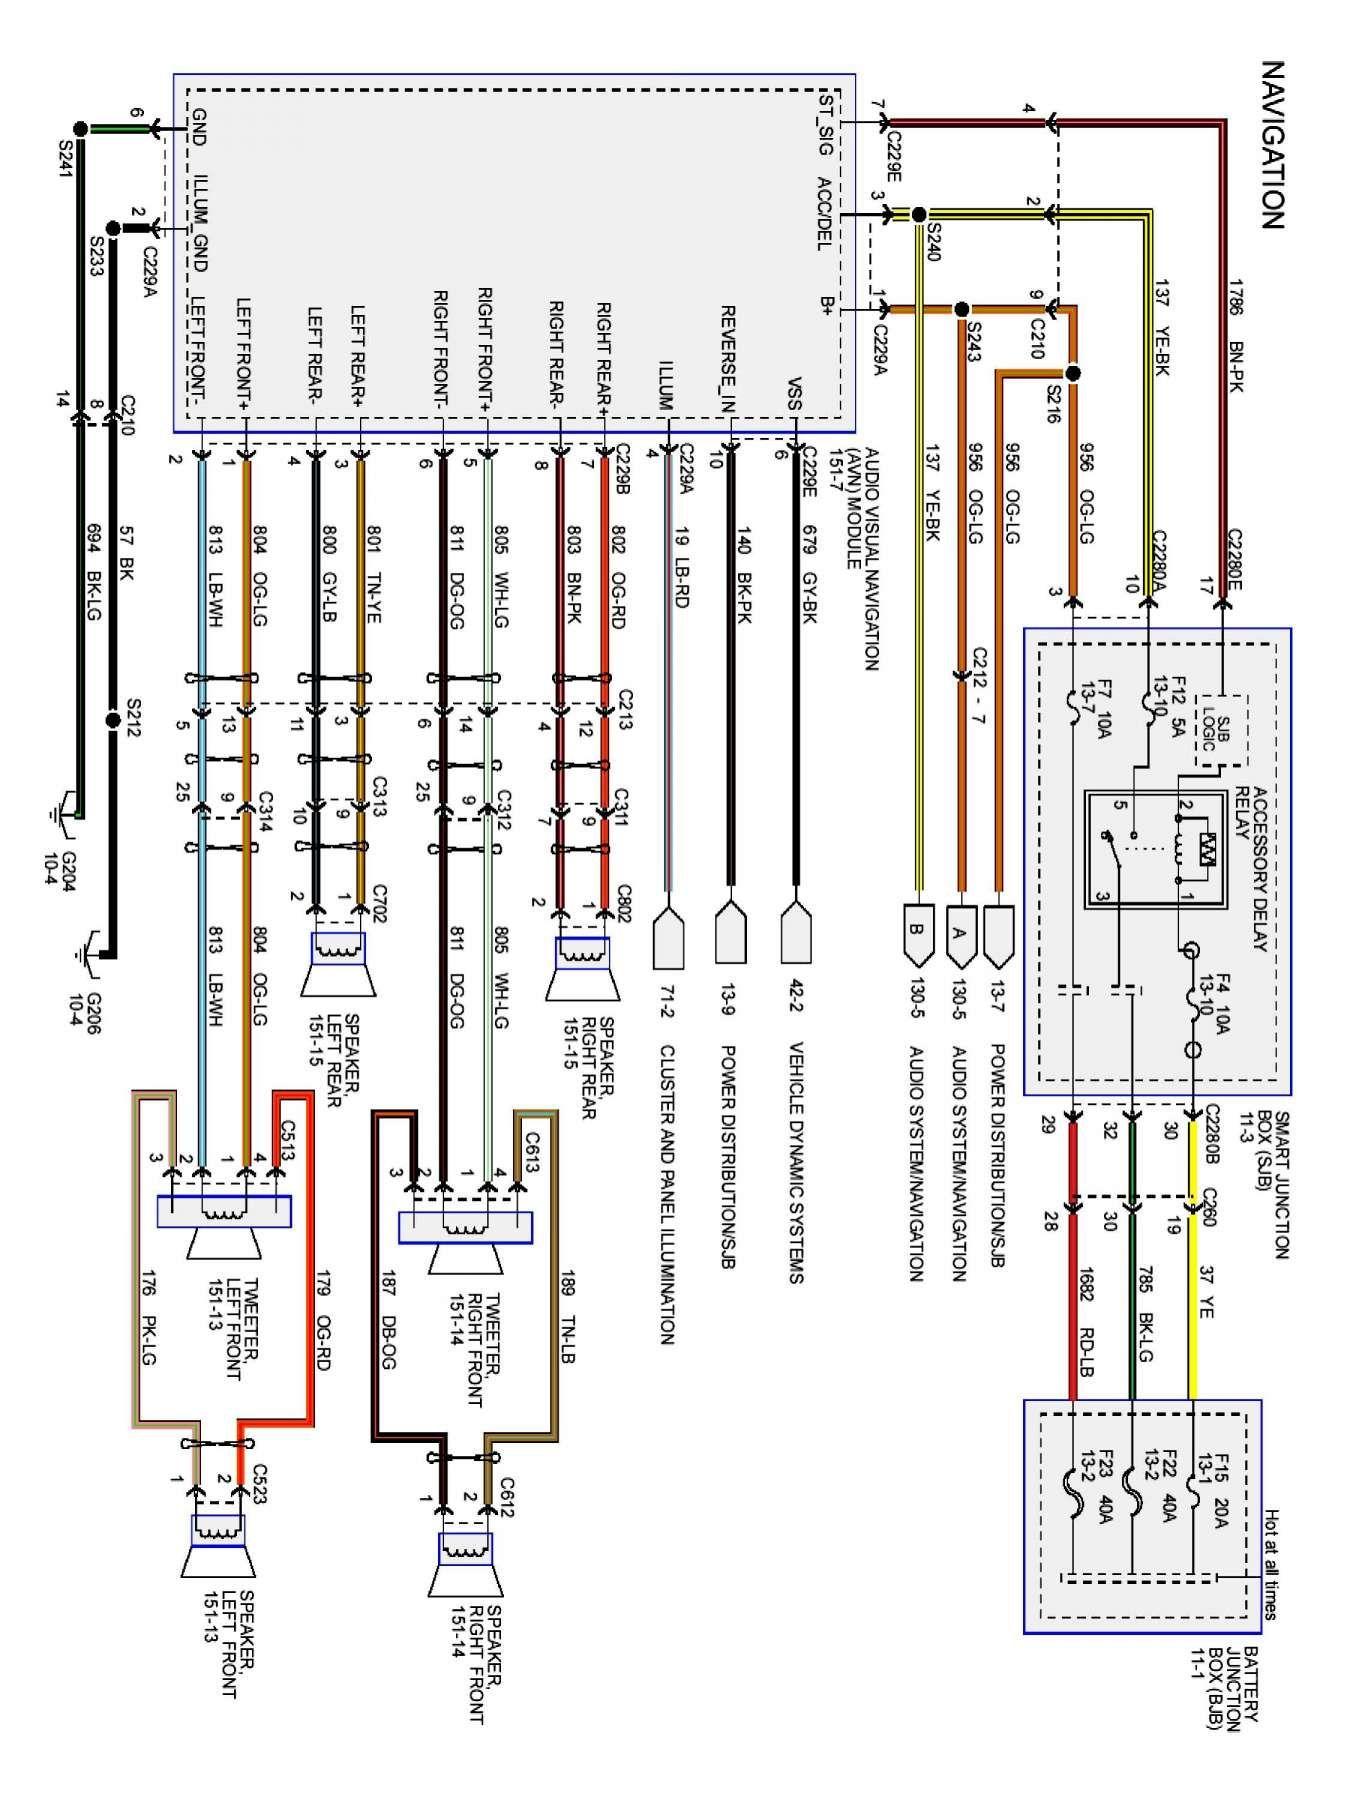 17+ 2008 ford focus car stereo wiring diagram - car diagram - wiringg.net |  ford escape, ford focus car, ford focus  pinterest